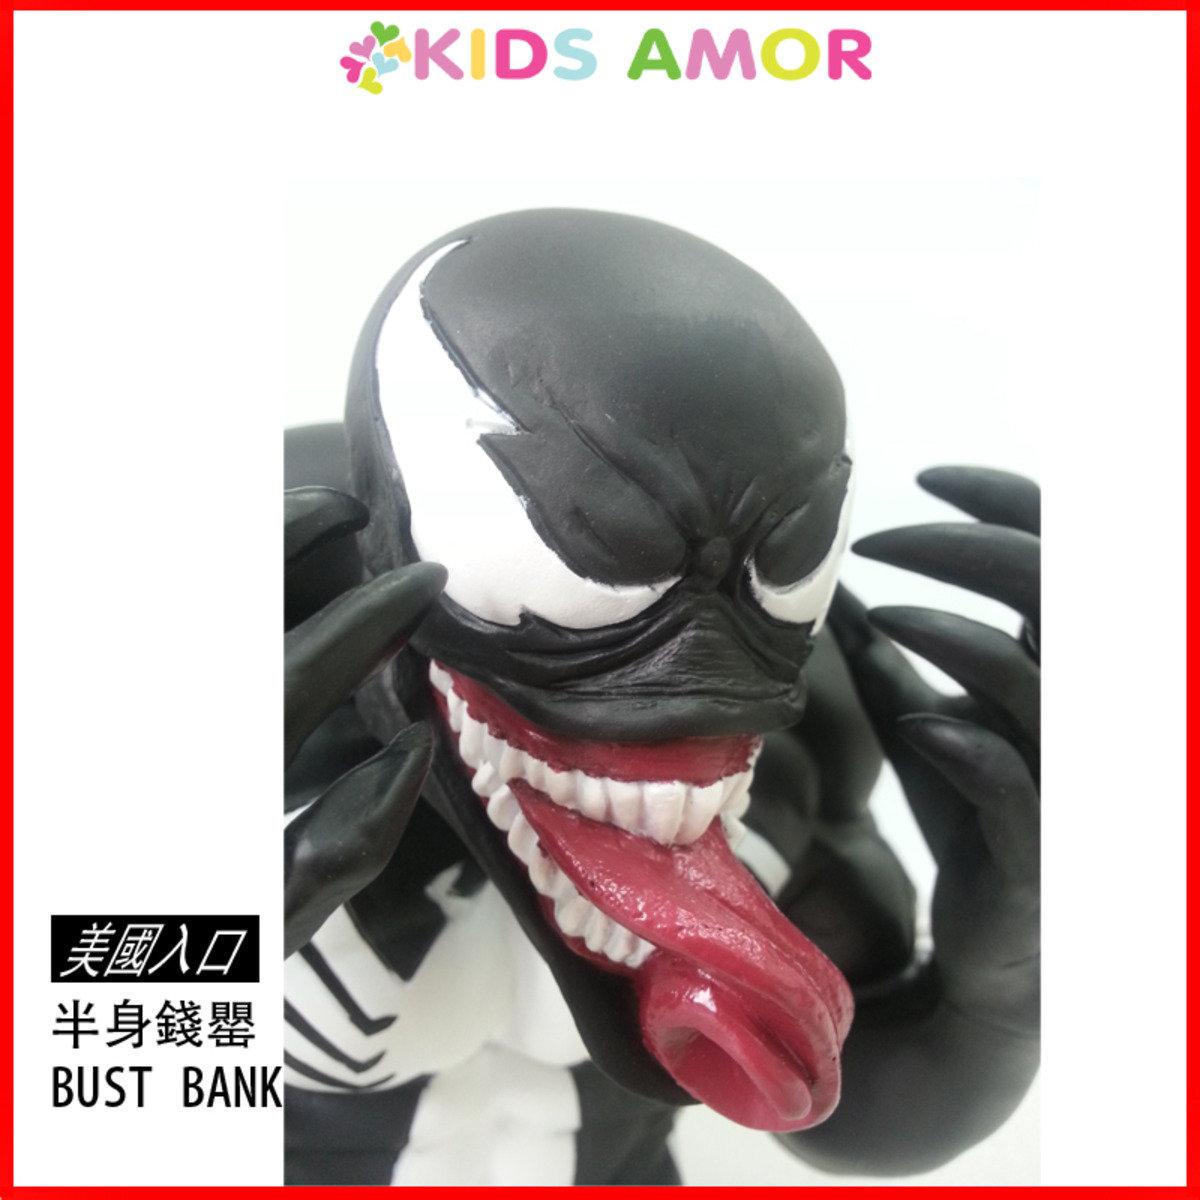 Marvel 毒魔 Venom 蜘蛛俠系列半身錢罌